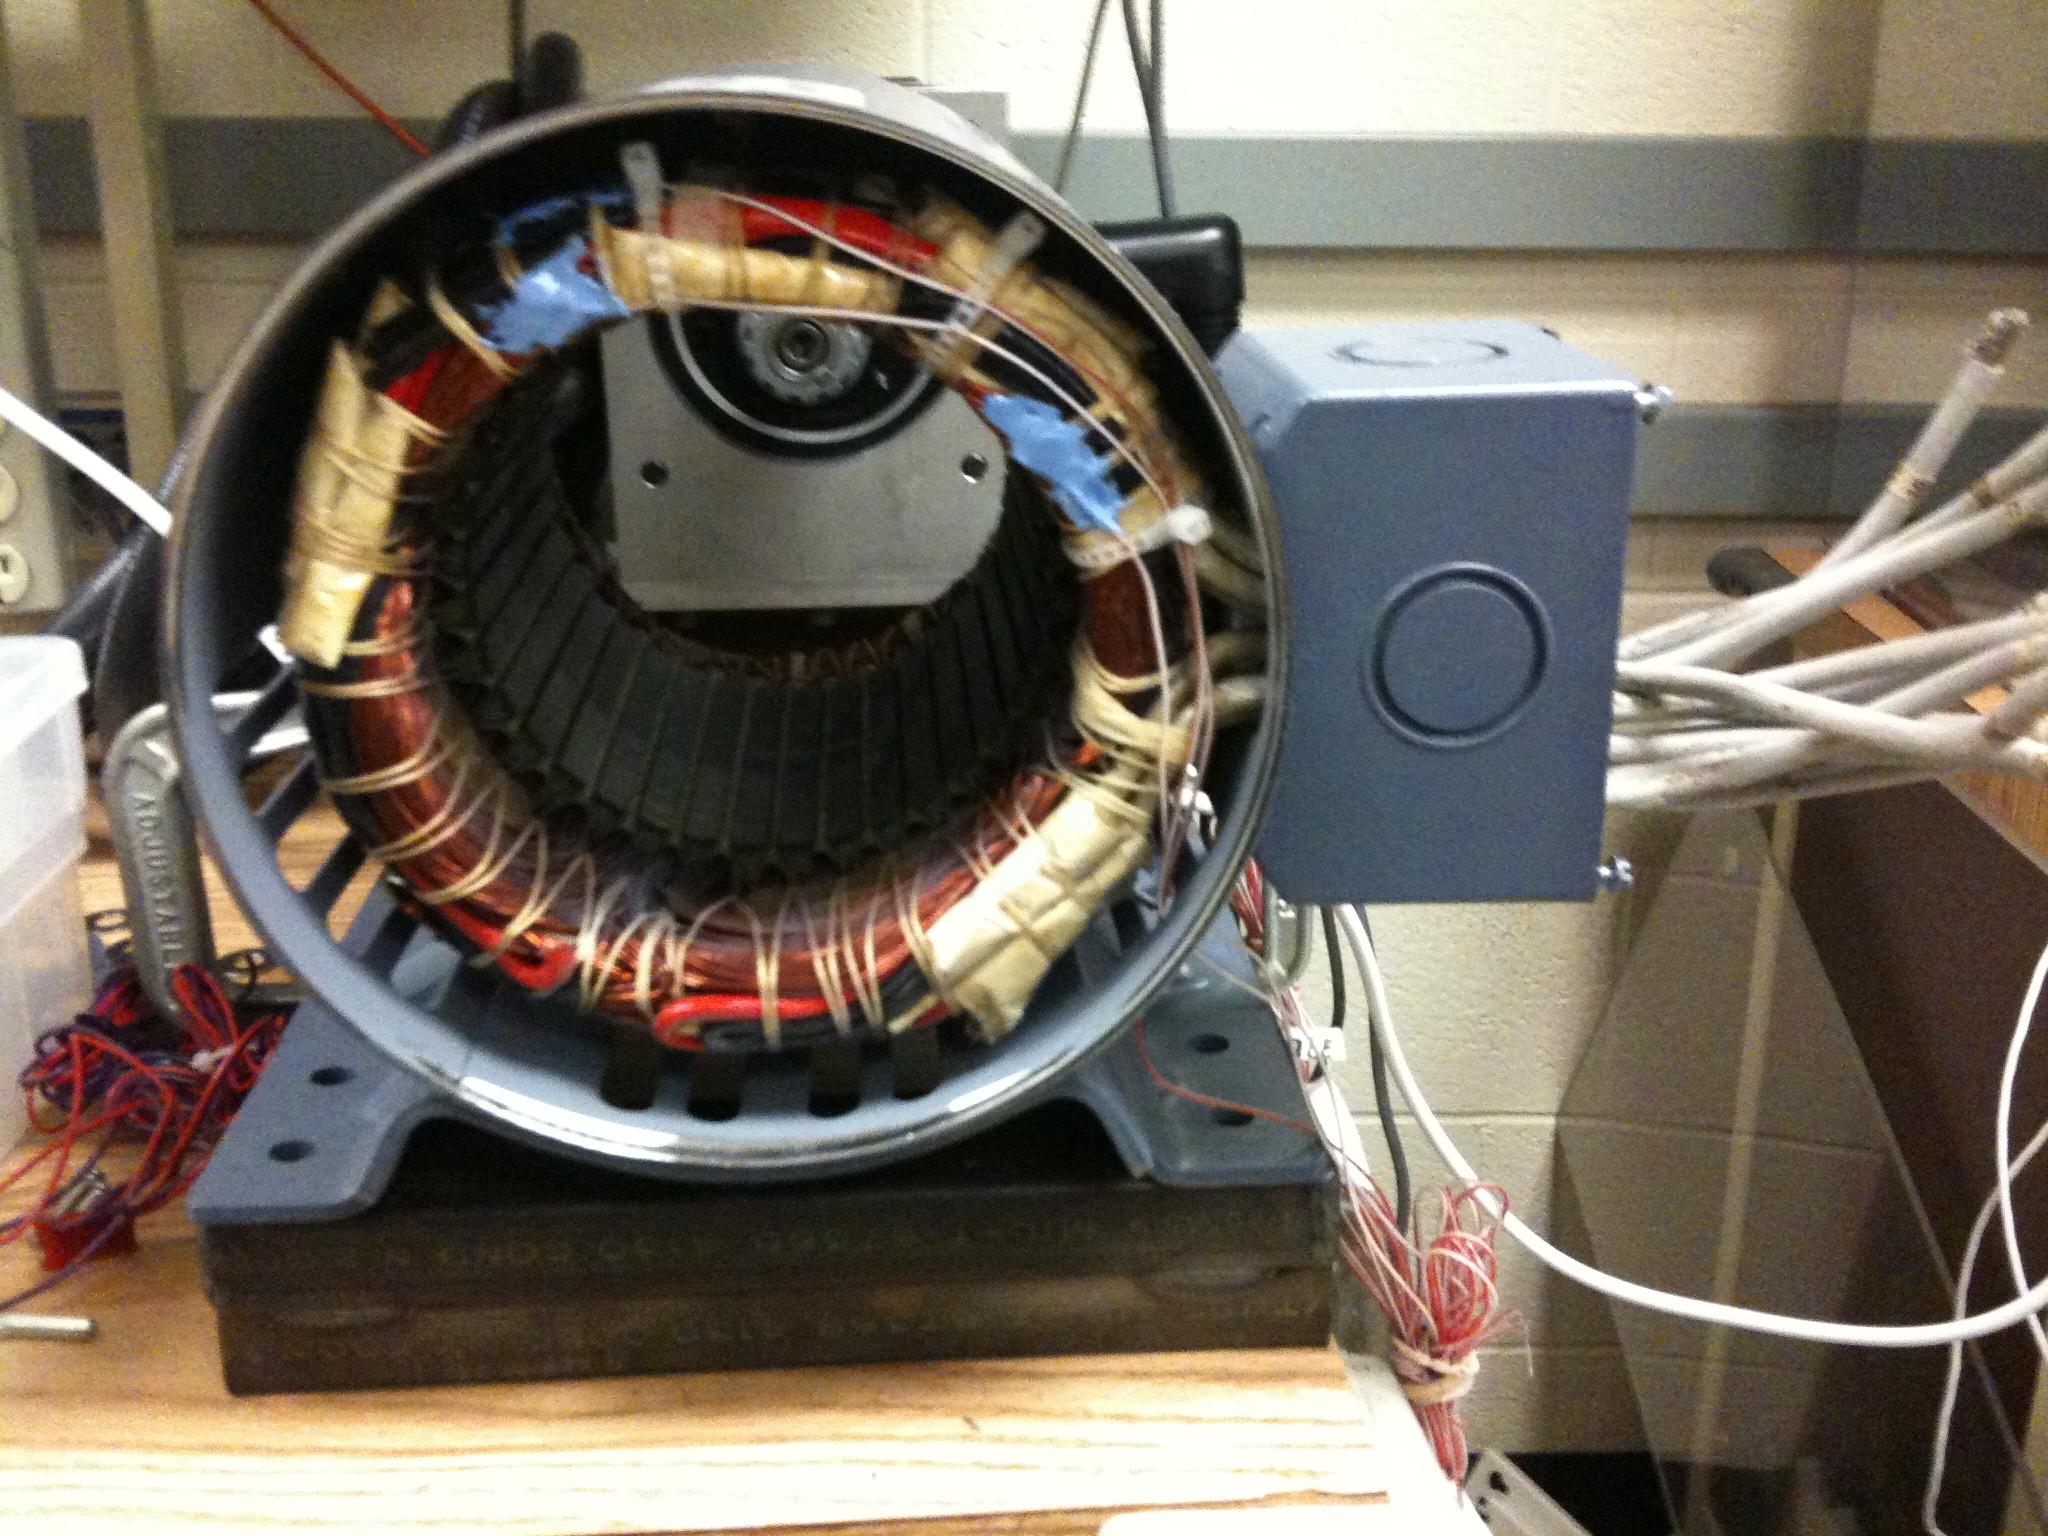 Inside the A.O. Smith drive motor